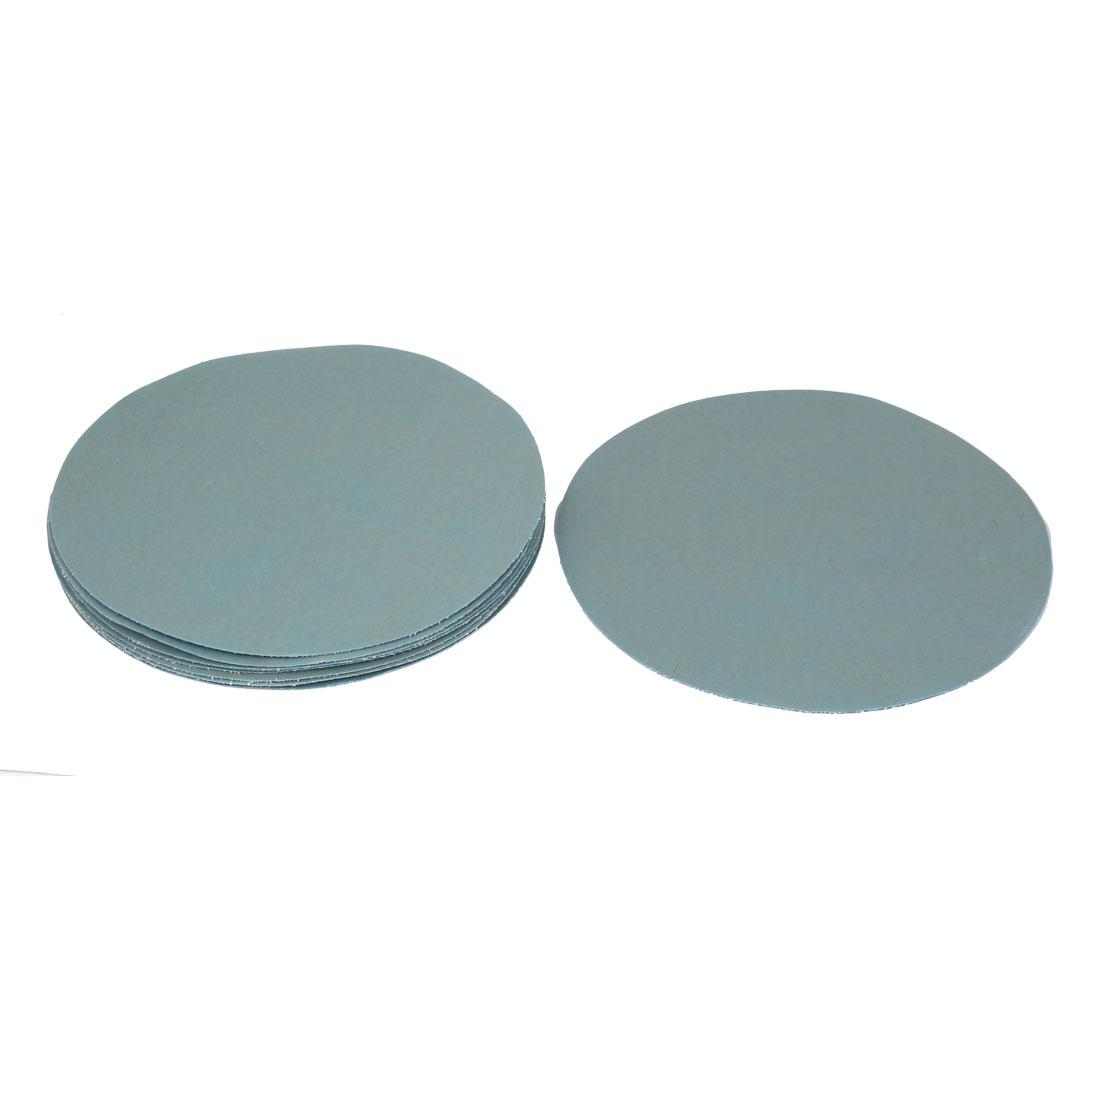 "7"" Dia Wet Dry Silicone Carbide 5000 Grit Polishing Sand Paper 10pcs"